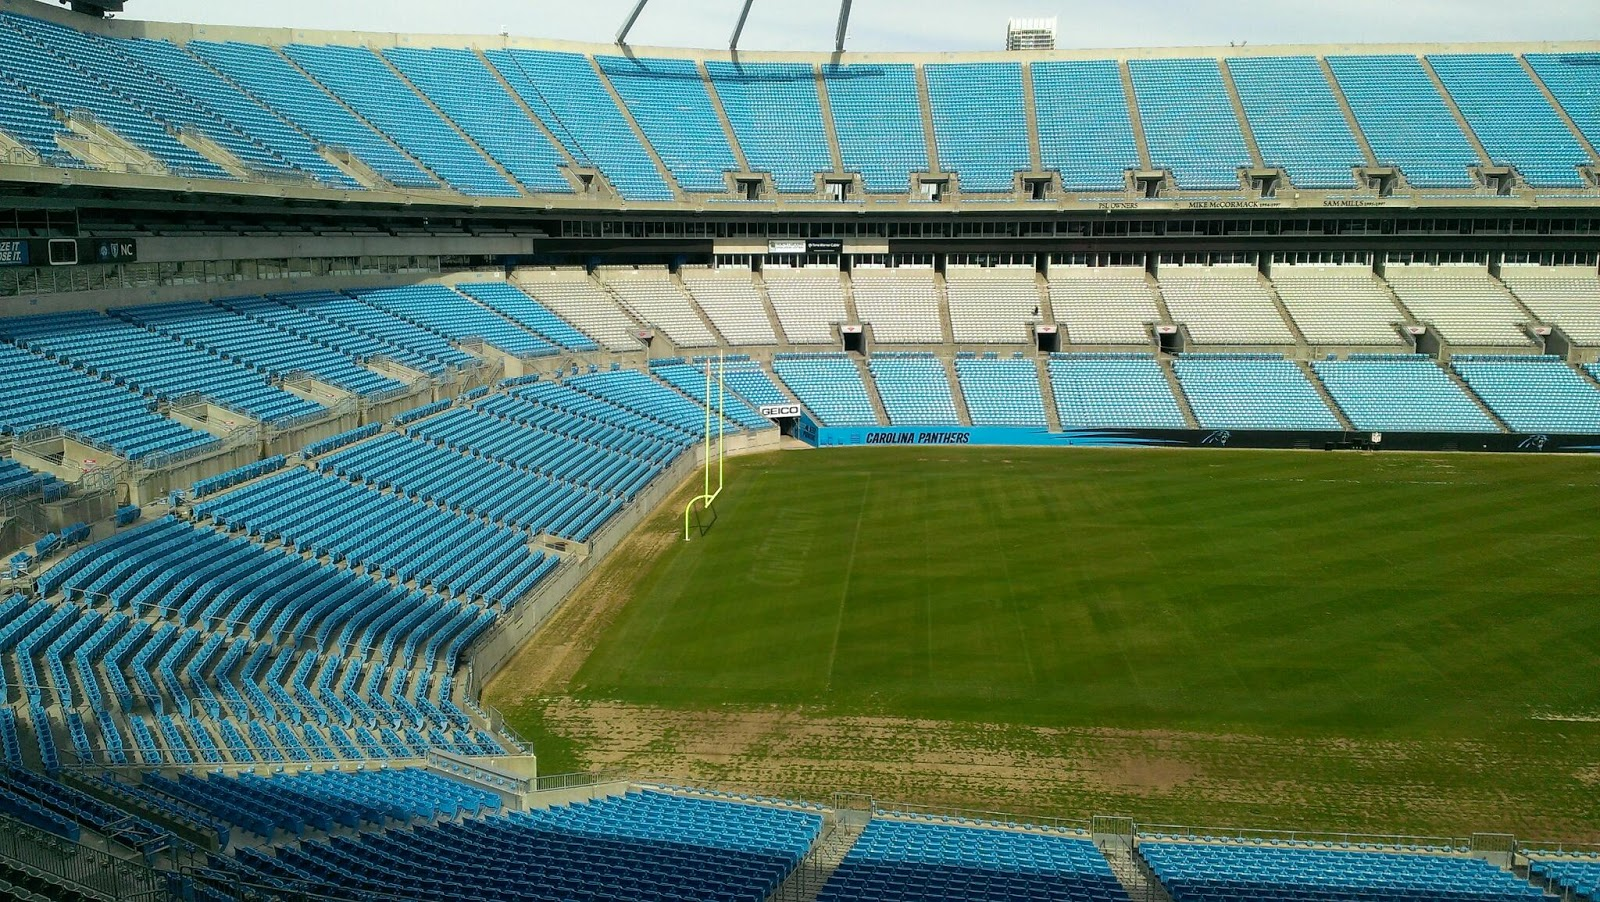 Bank Of America Stadium Home Of The Carolina Panthers